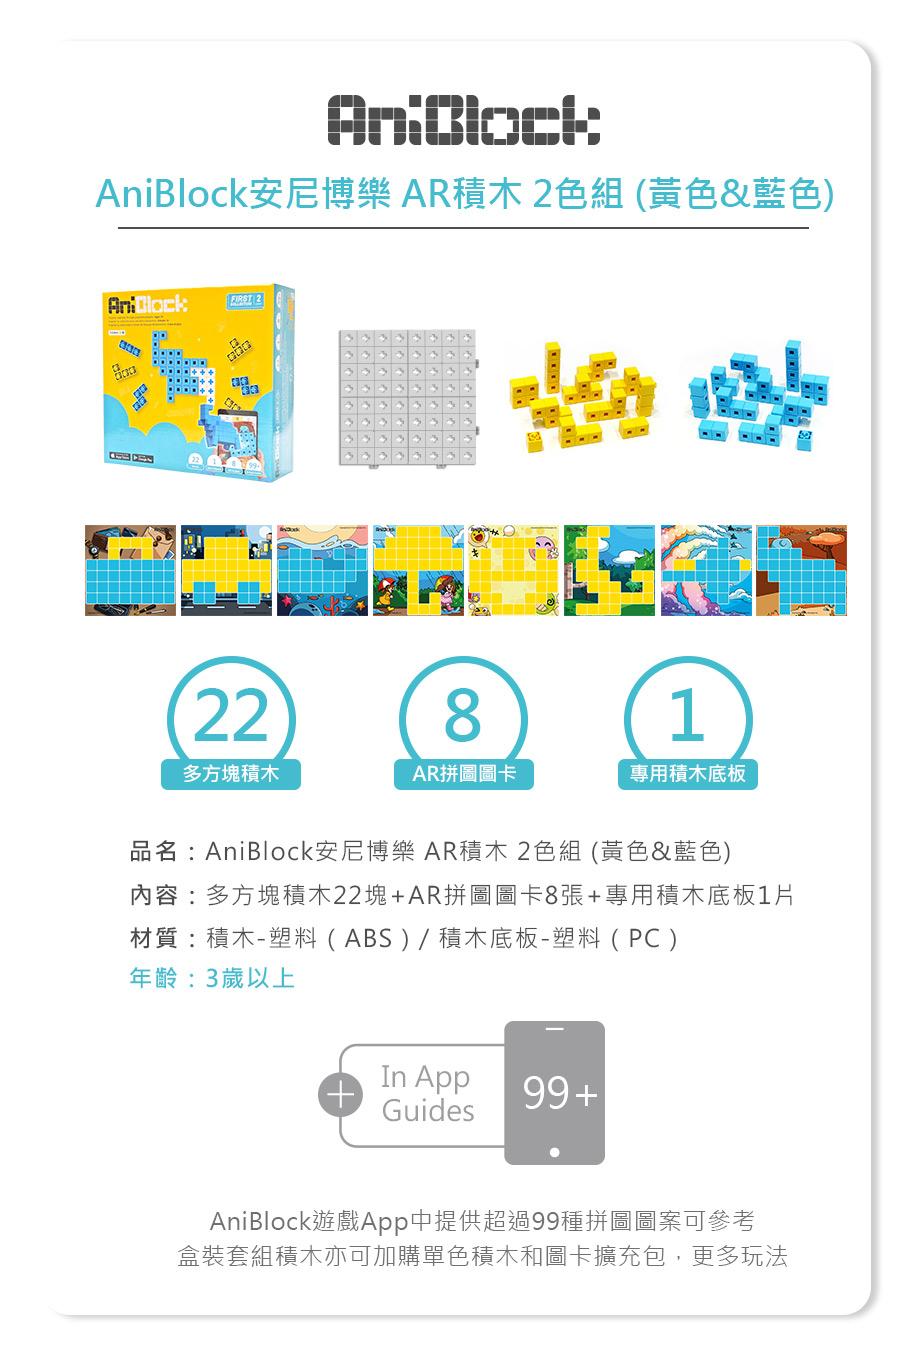 AniBlock AR積木拼圖 2色 黃藍 產品規格介紹